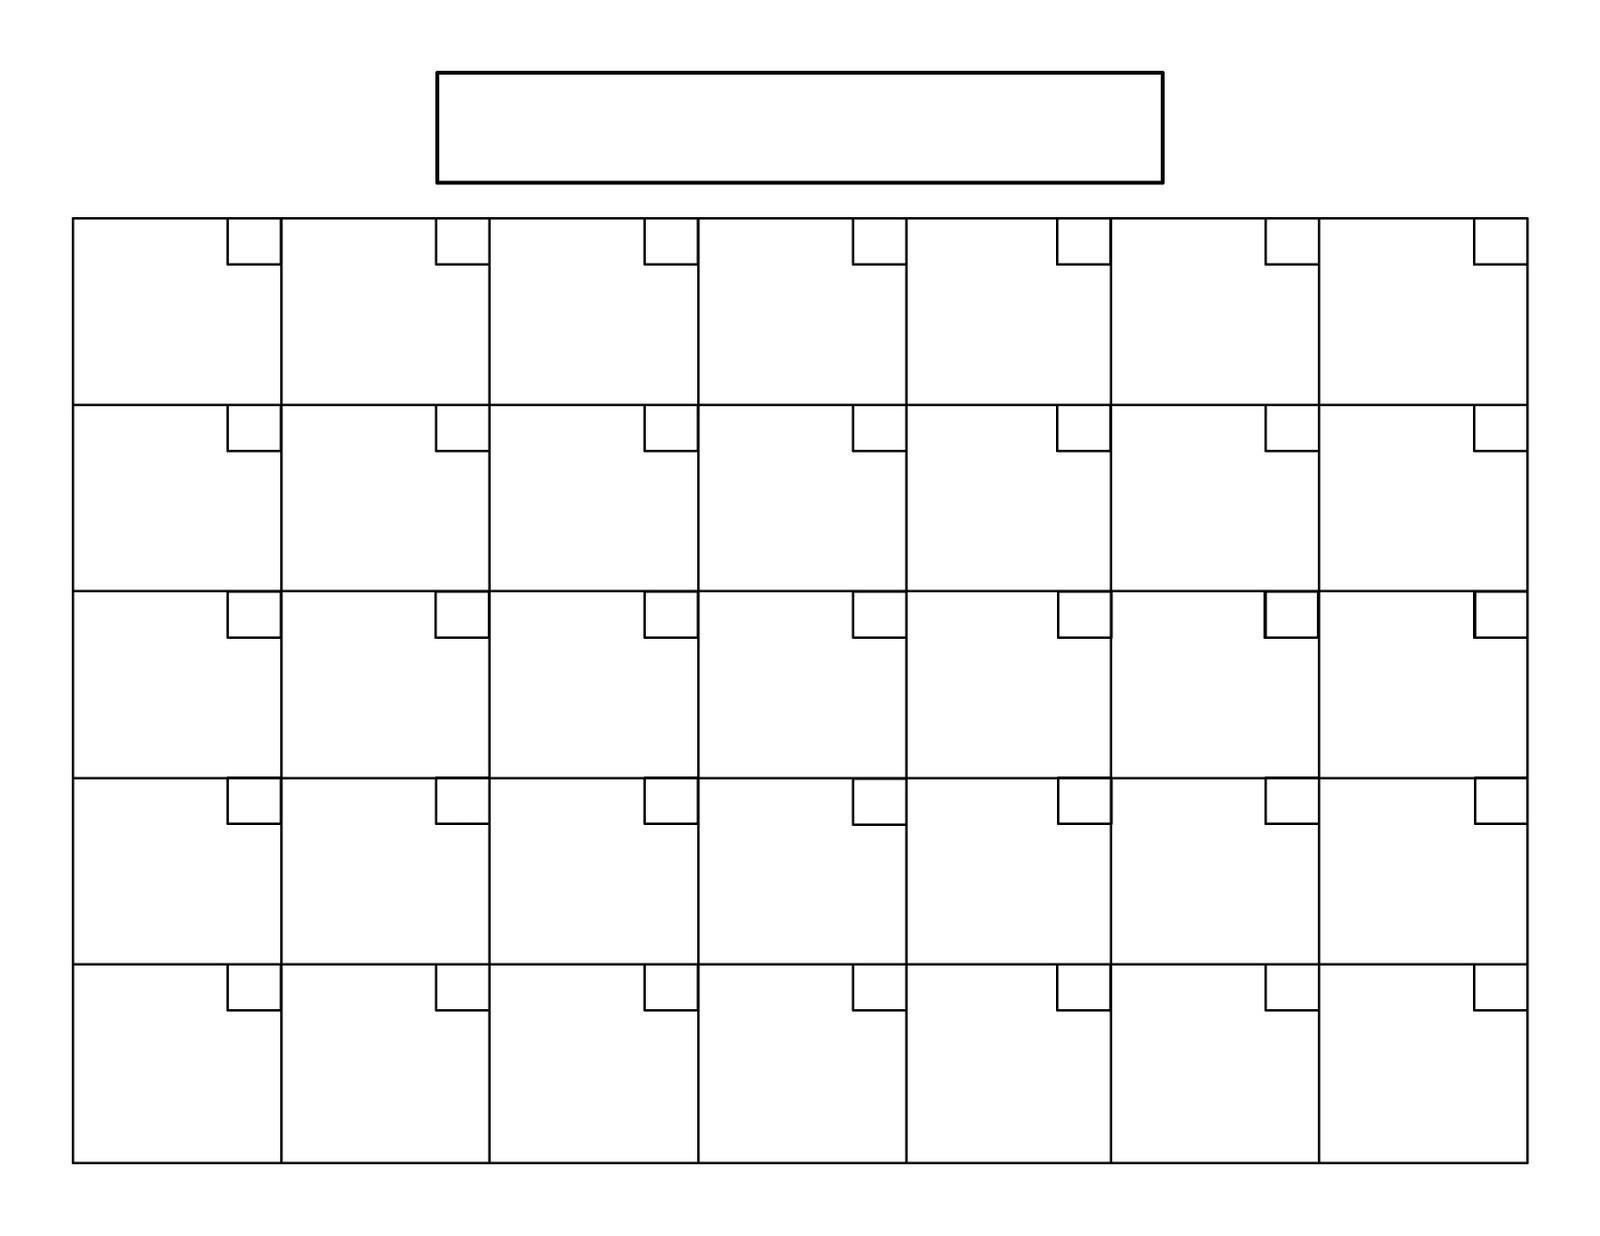 Printable 5 Day Calendar Blank Calendar Template 5 Day Week 0 8 With with Blank Calendar Printable 5 Day